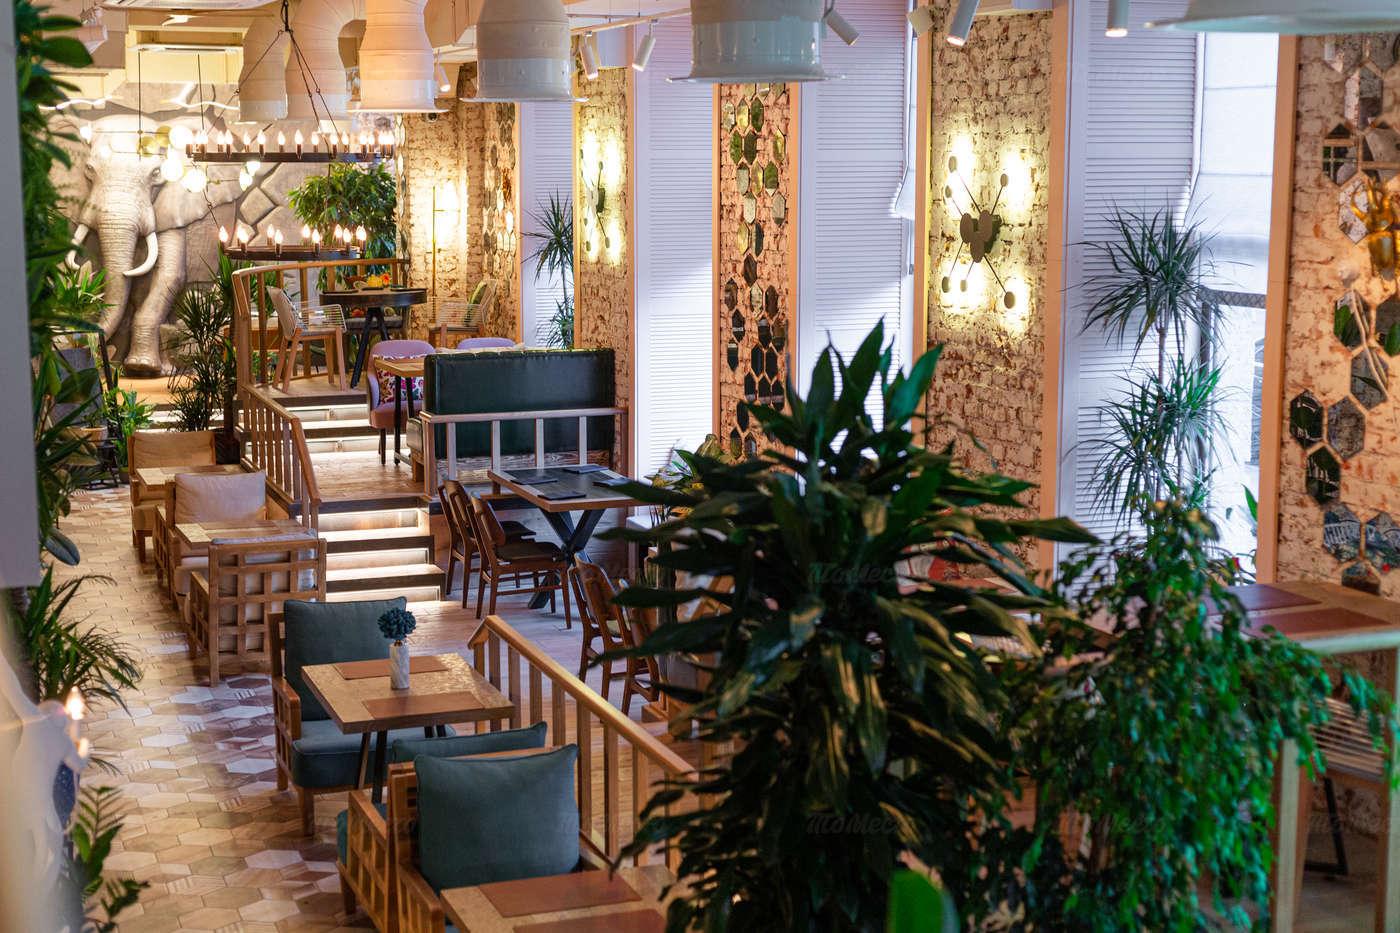 Ресторан Чанг (Chang) на Московском проспекте фото 5